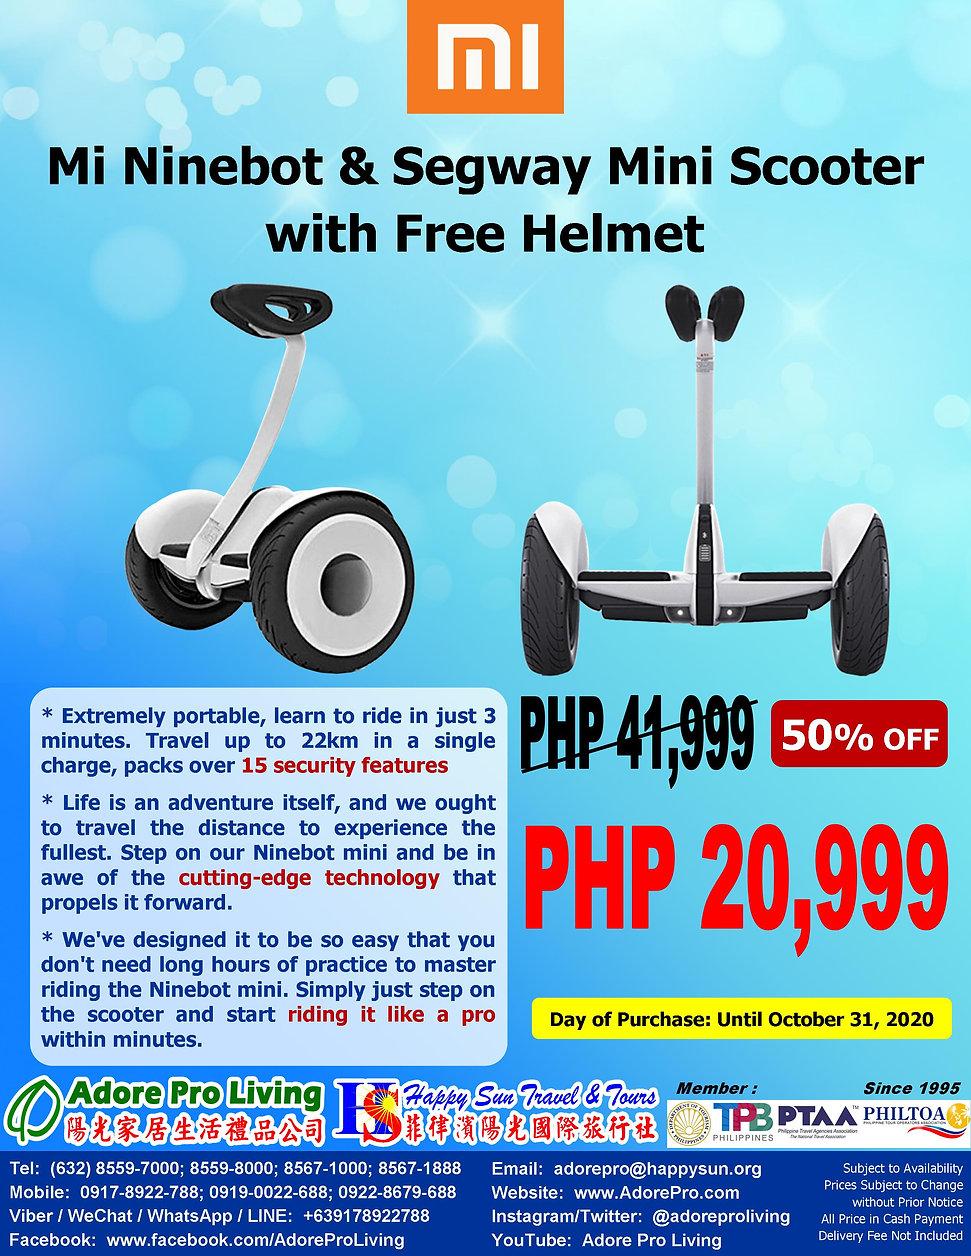 2B.NinebotSegwayMiniScooter_Mi_20201014.